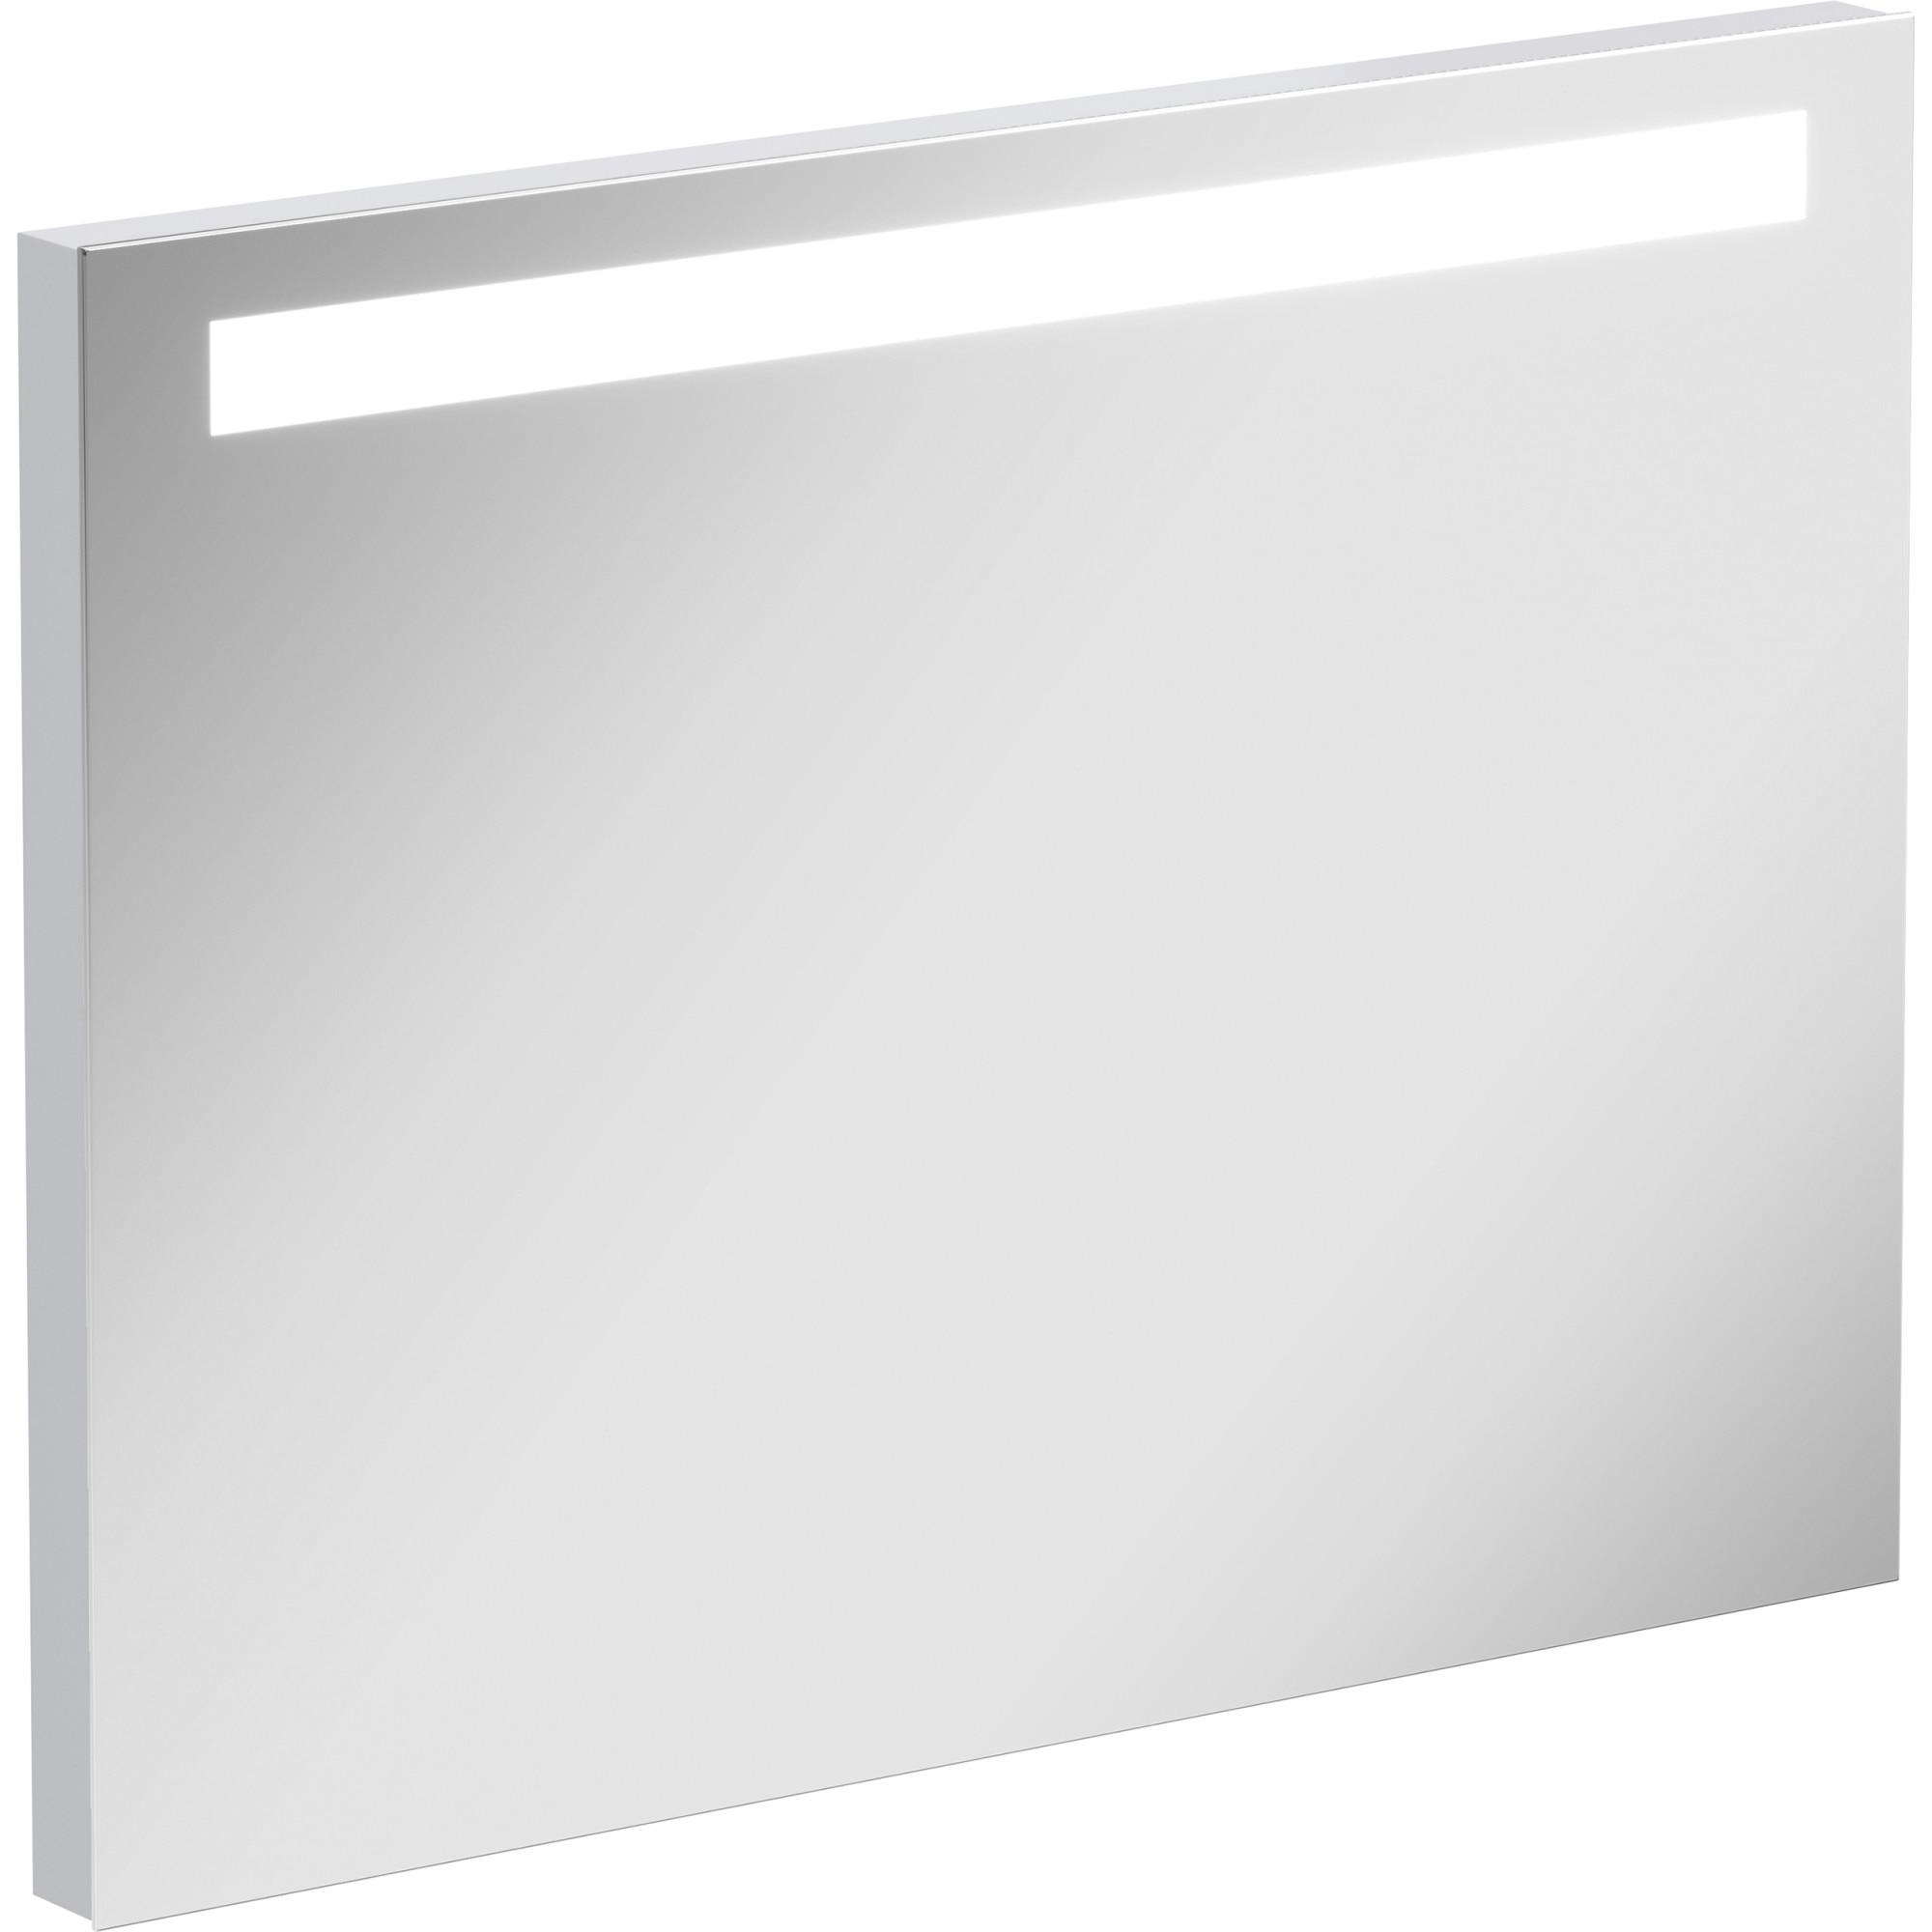 Fotografie Oglinda Cersanit Metropolitan OS581-015, iluminare led, 80x60x4.7 cm